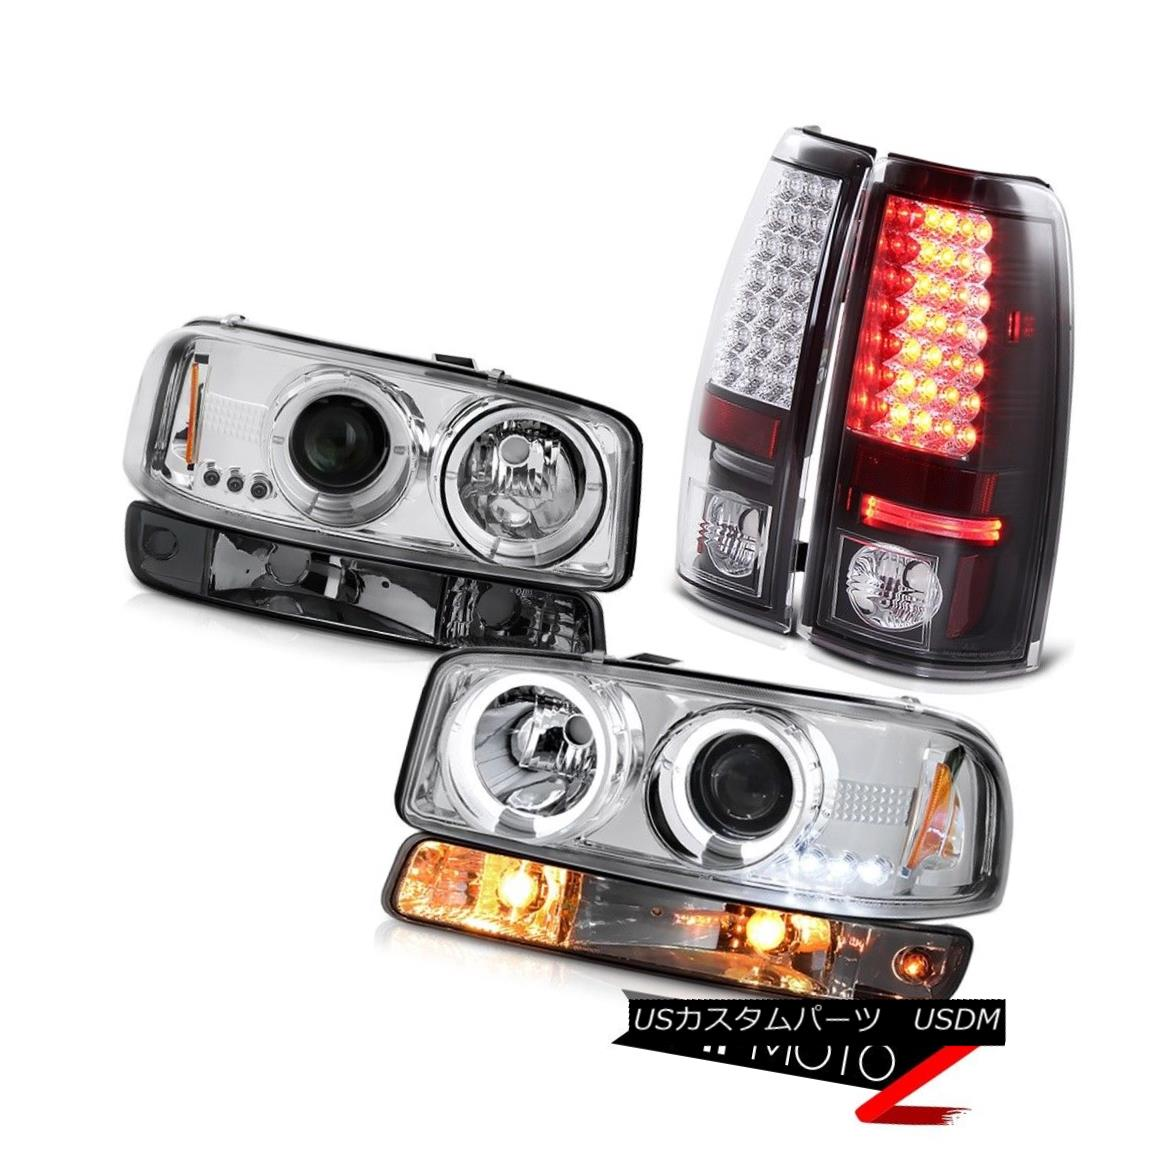 Sierra 5.3L Tail 99-06 99-06シエラ5.3Lテールランプダークスパーキングライトクリアクロームヘッドライト ヘッドライト headlamps dark parking smoke light clear chrome lamps